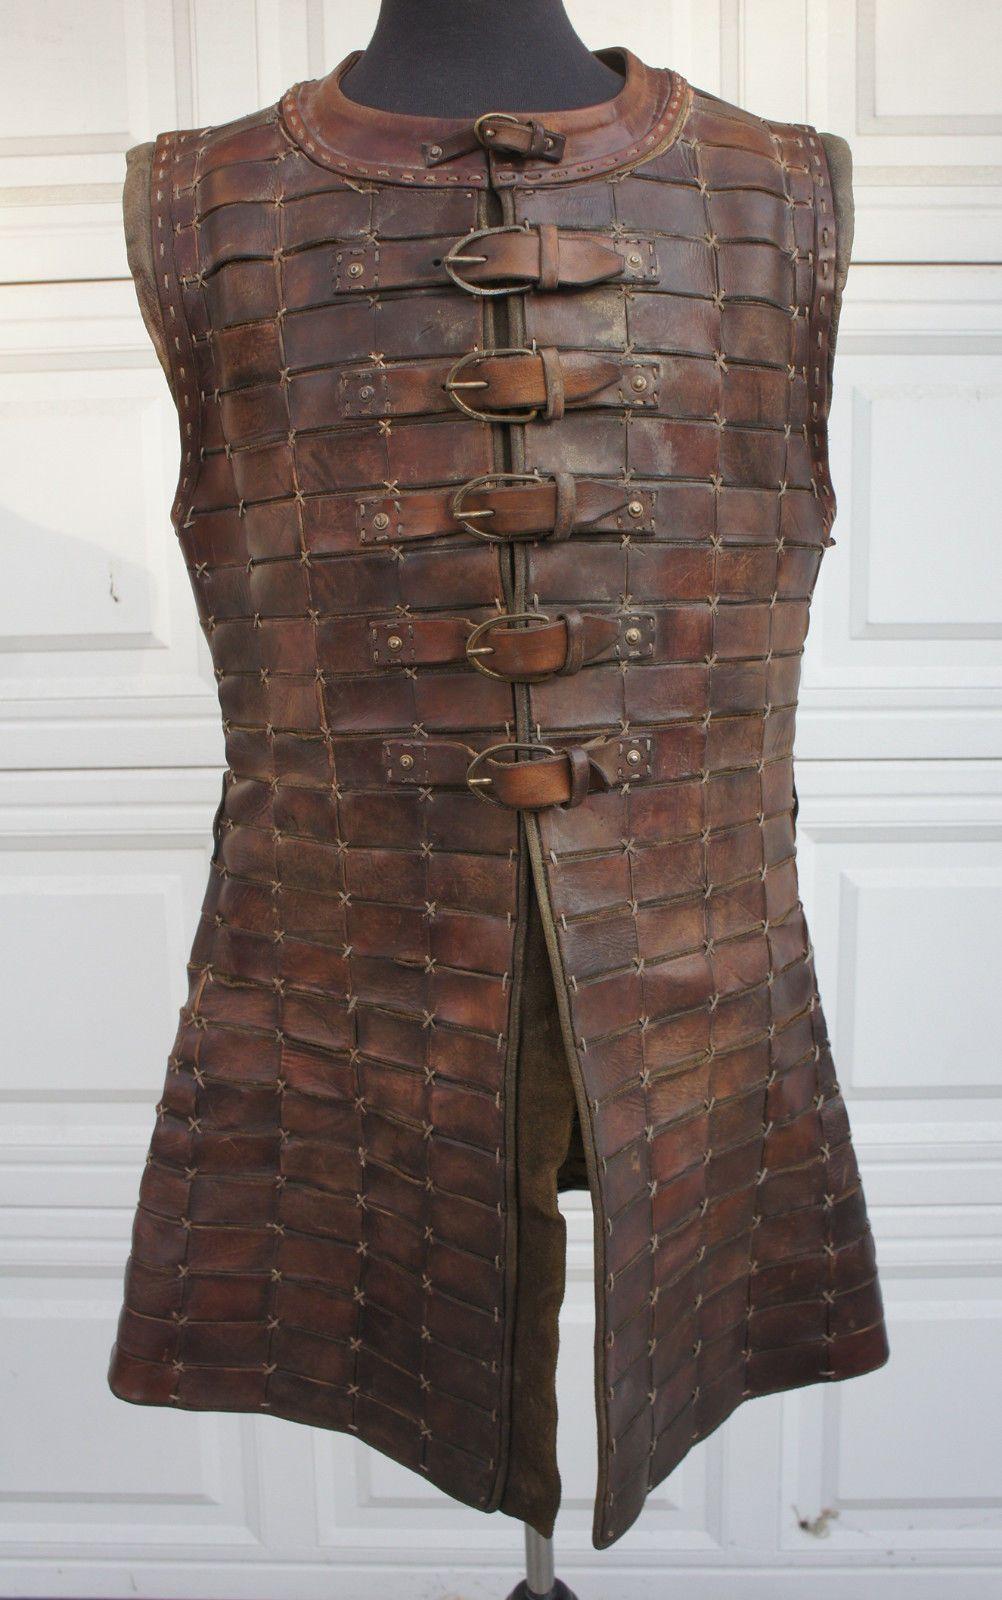 MEDIEVAL FANTASY NORMAN Mens Brown Black Leather BRIGANDINE BODY ARMOR LARP New